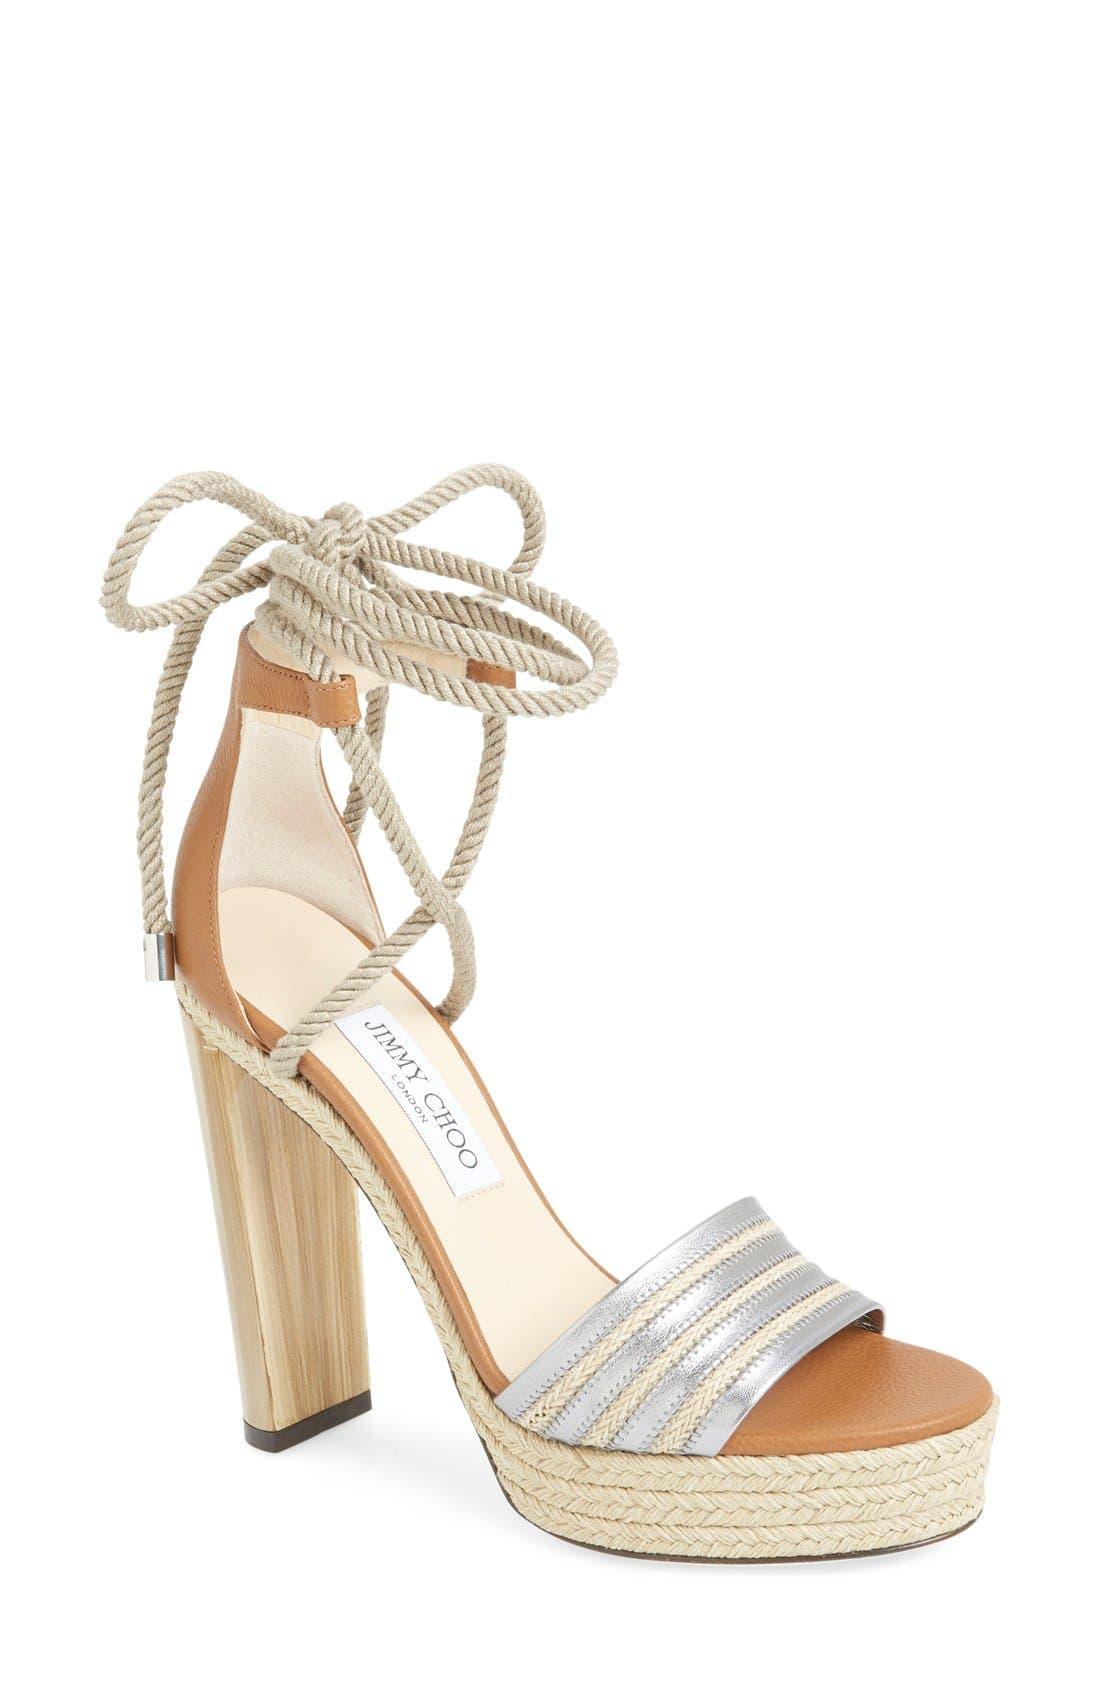 Main Image - Jimmy Choo 'Mayje' Platform Sandal (Women)